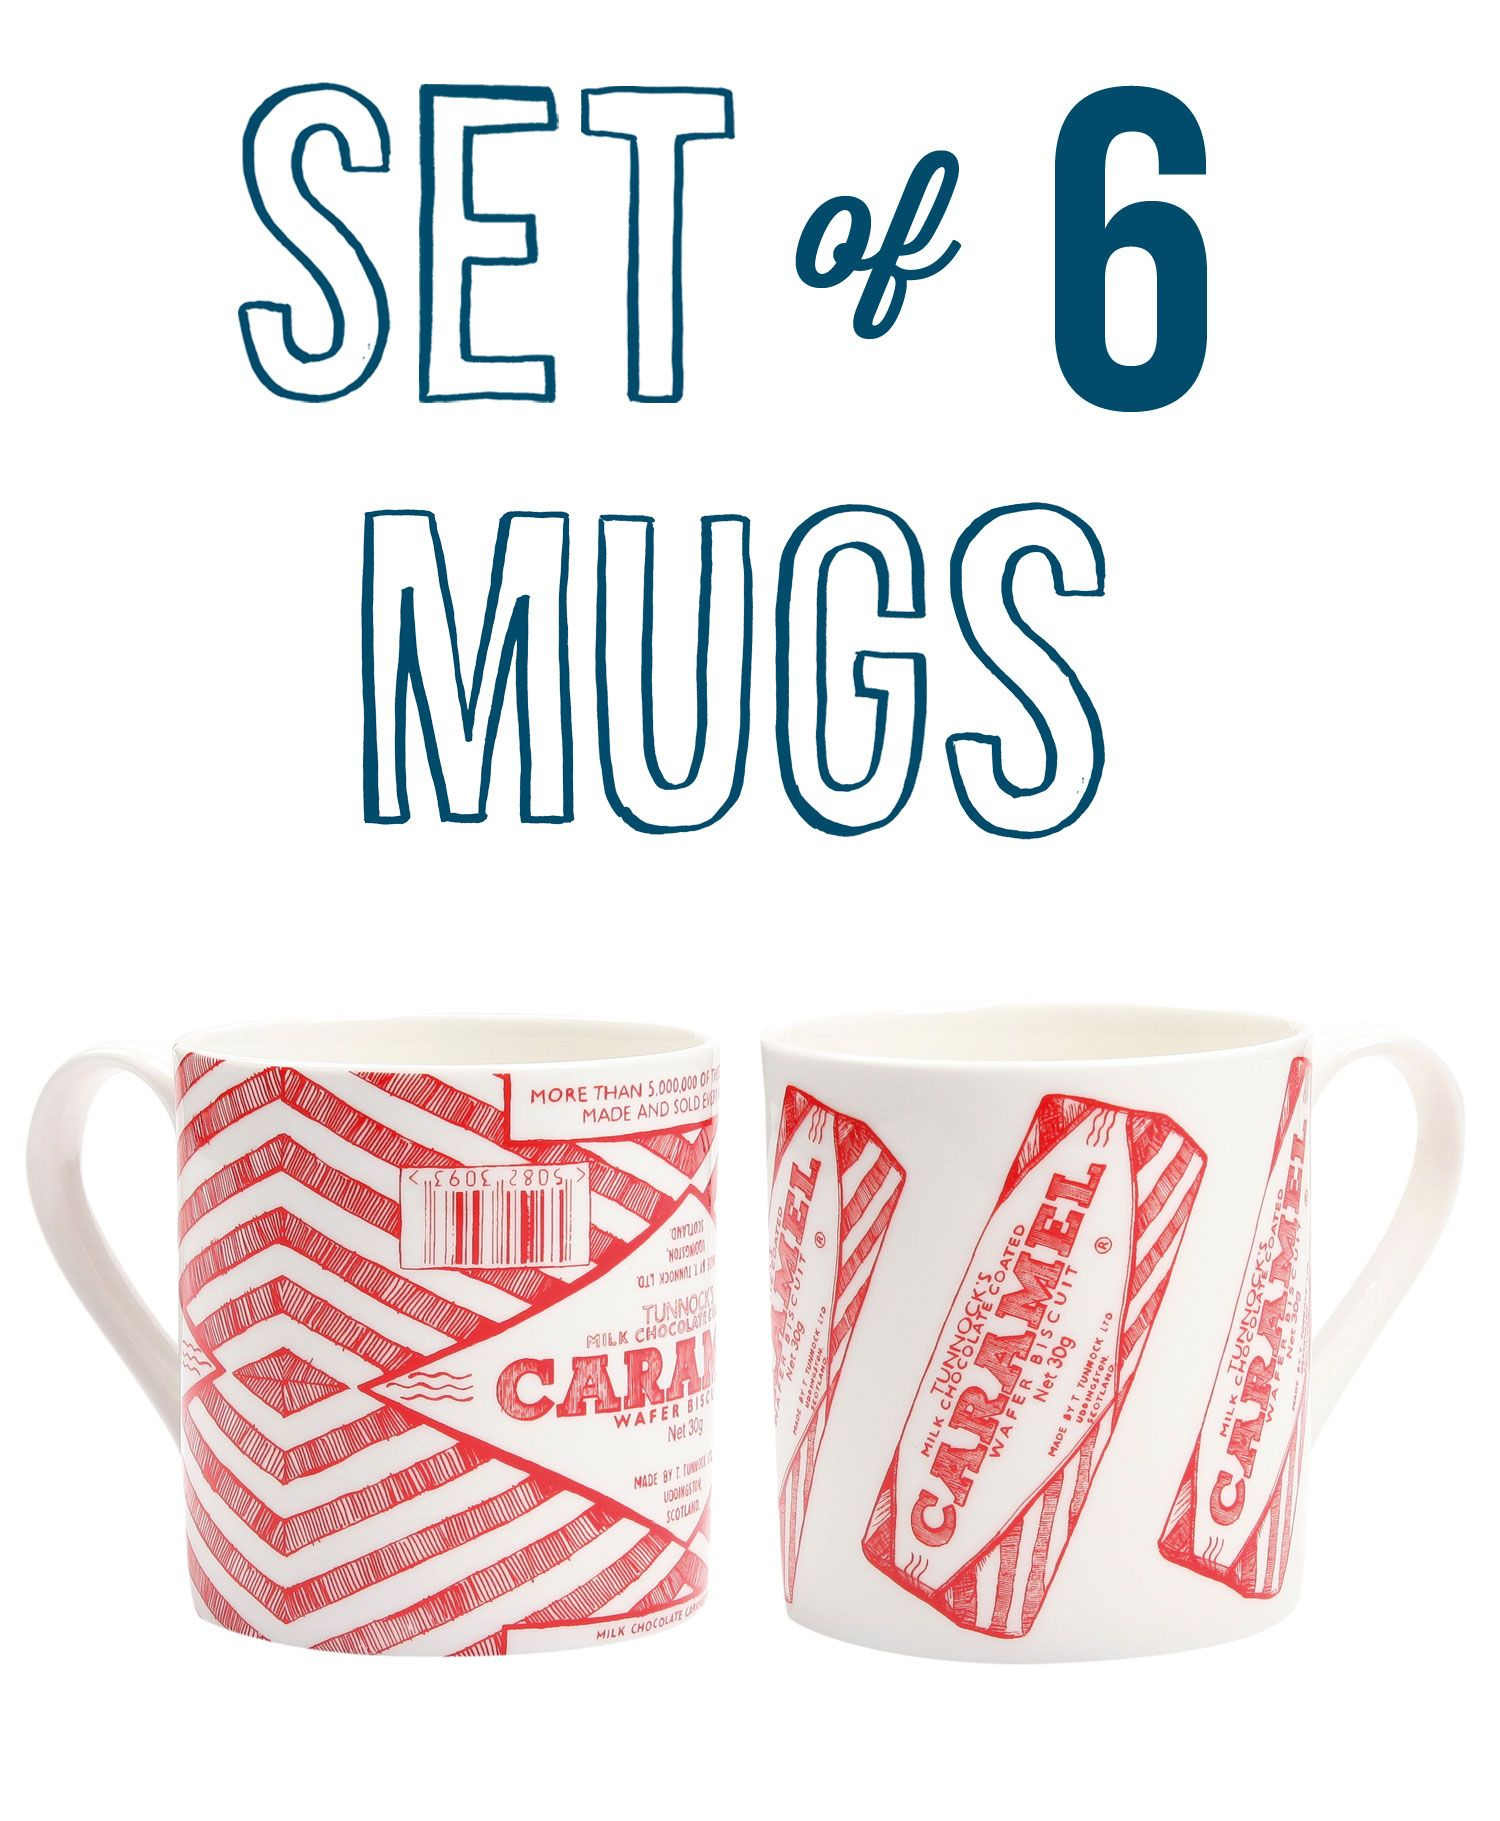 Irn Bru Keep retro Mug ideal affordable gift